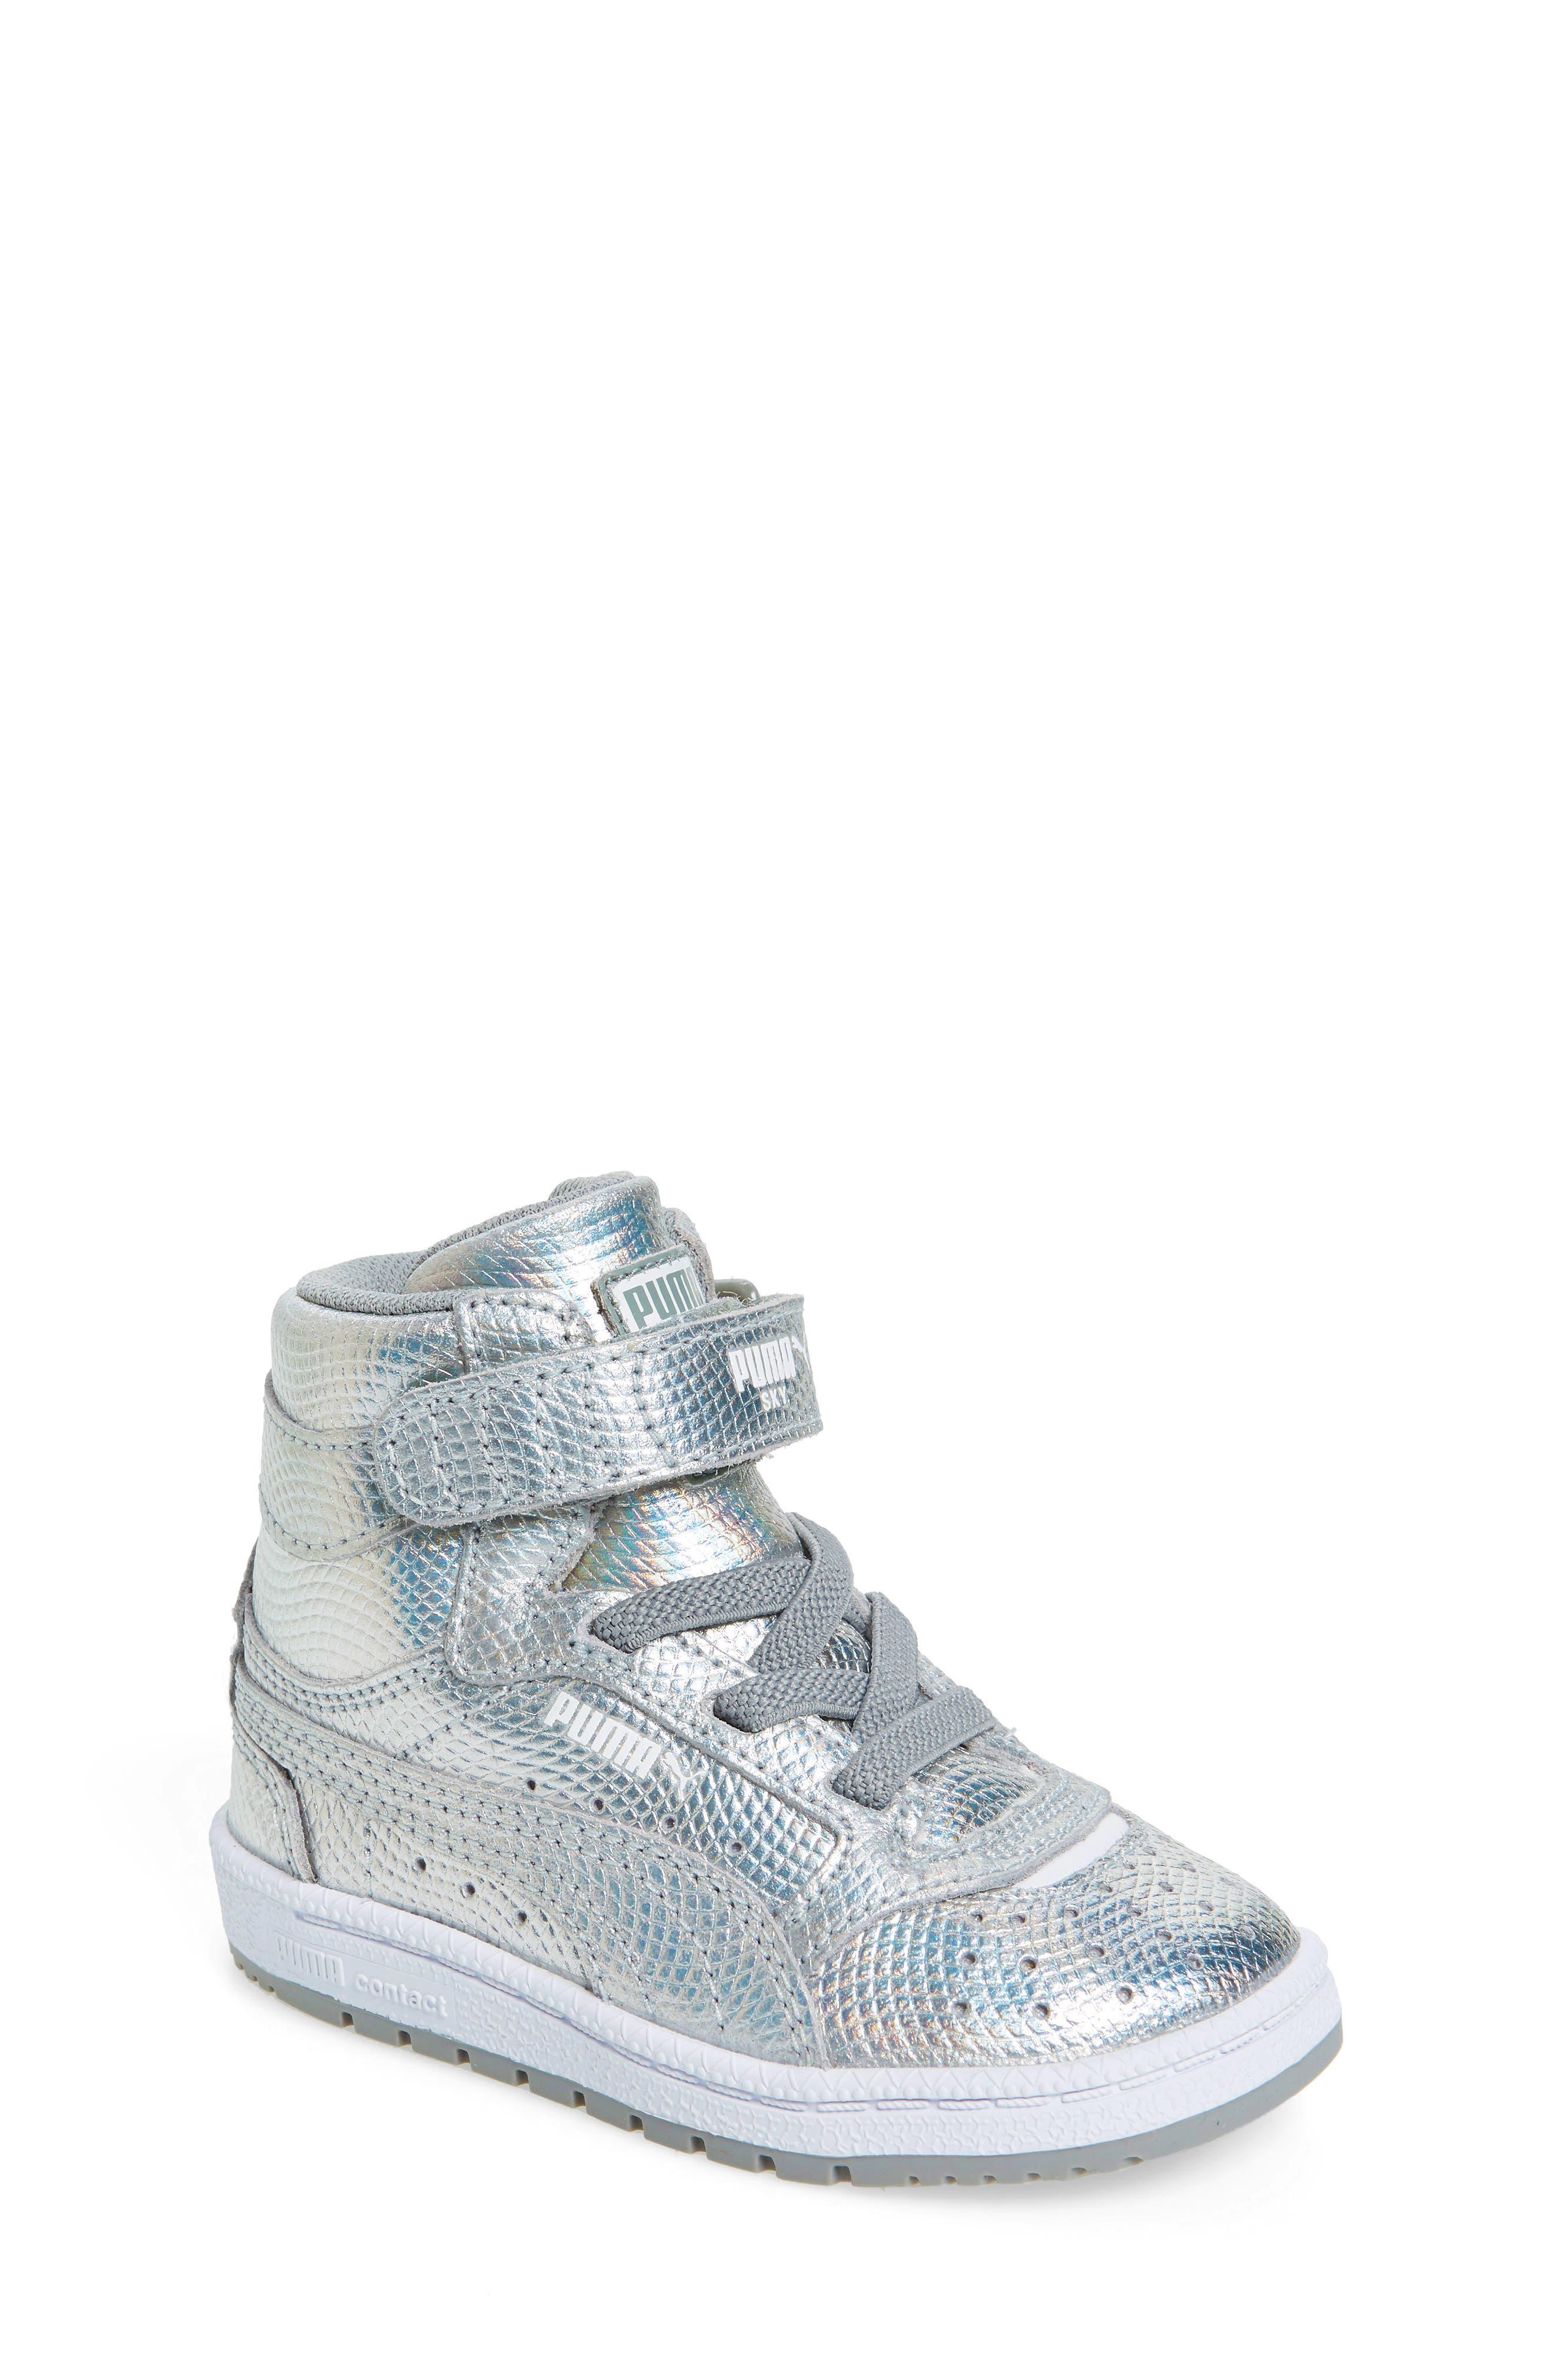 PUMA Sky II Hi Holo Iridescent Sneaker (Baby, Walker & Toddler)